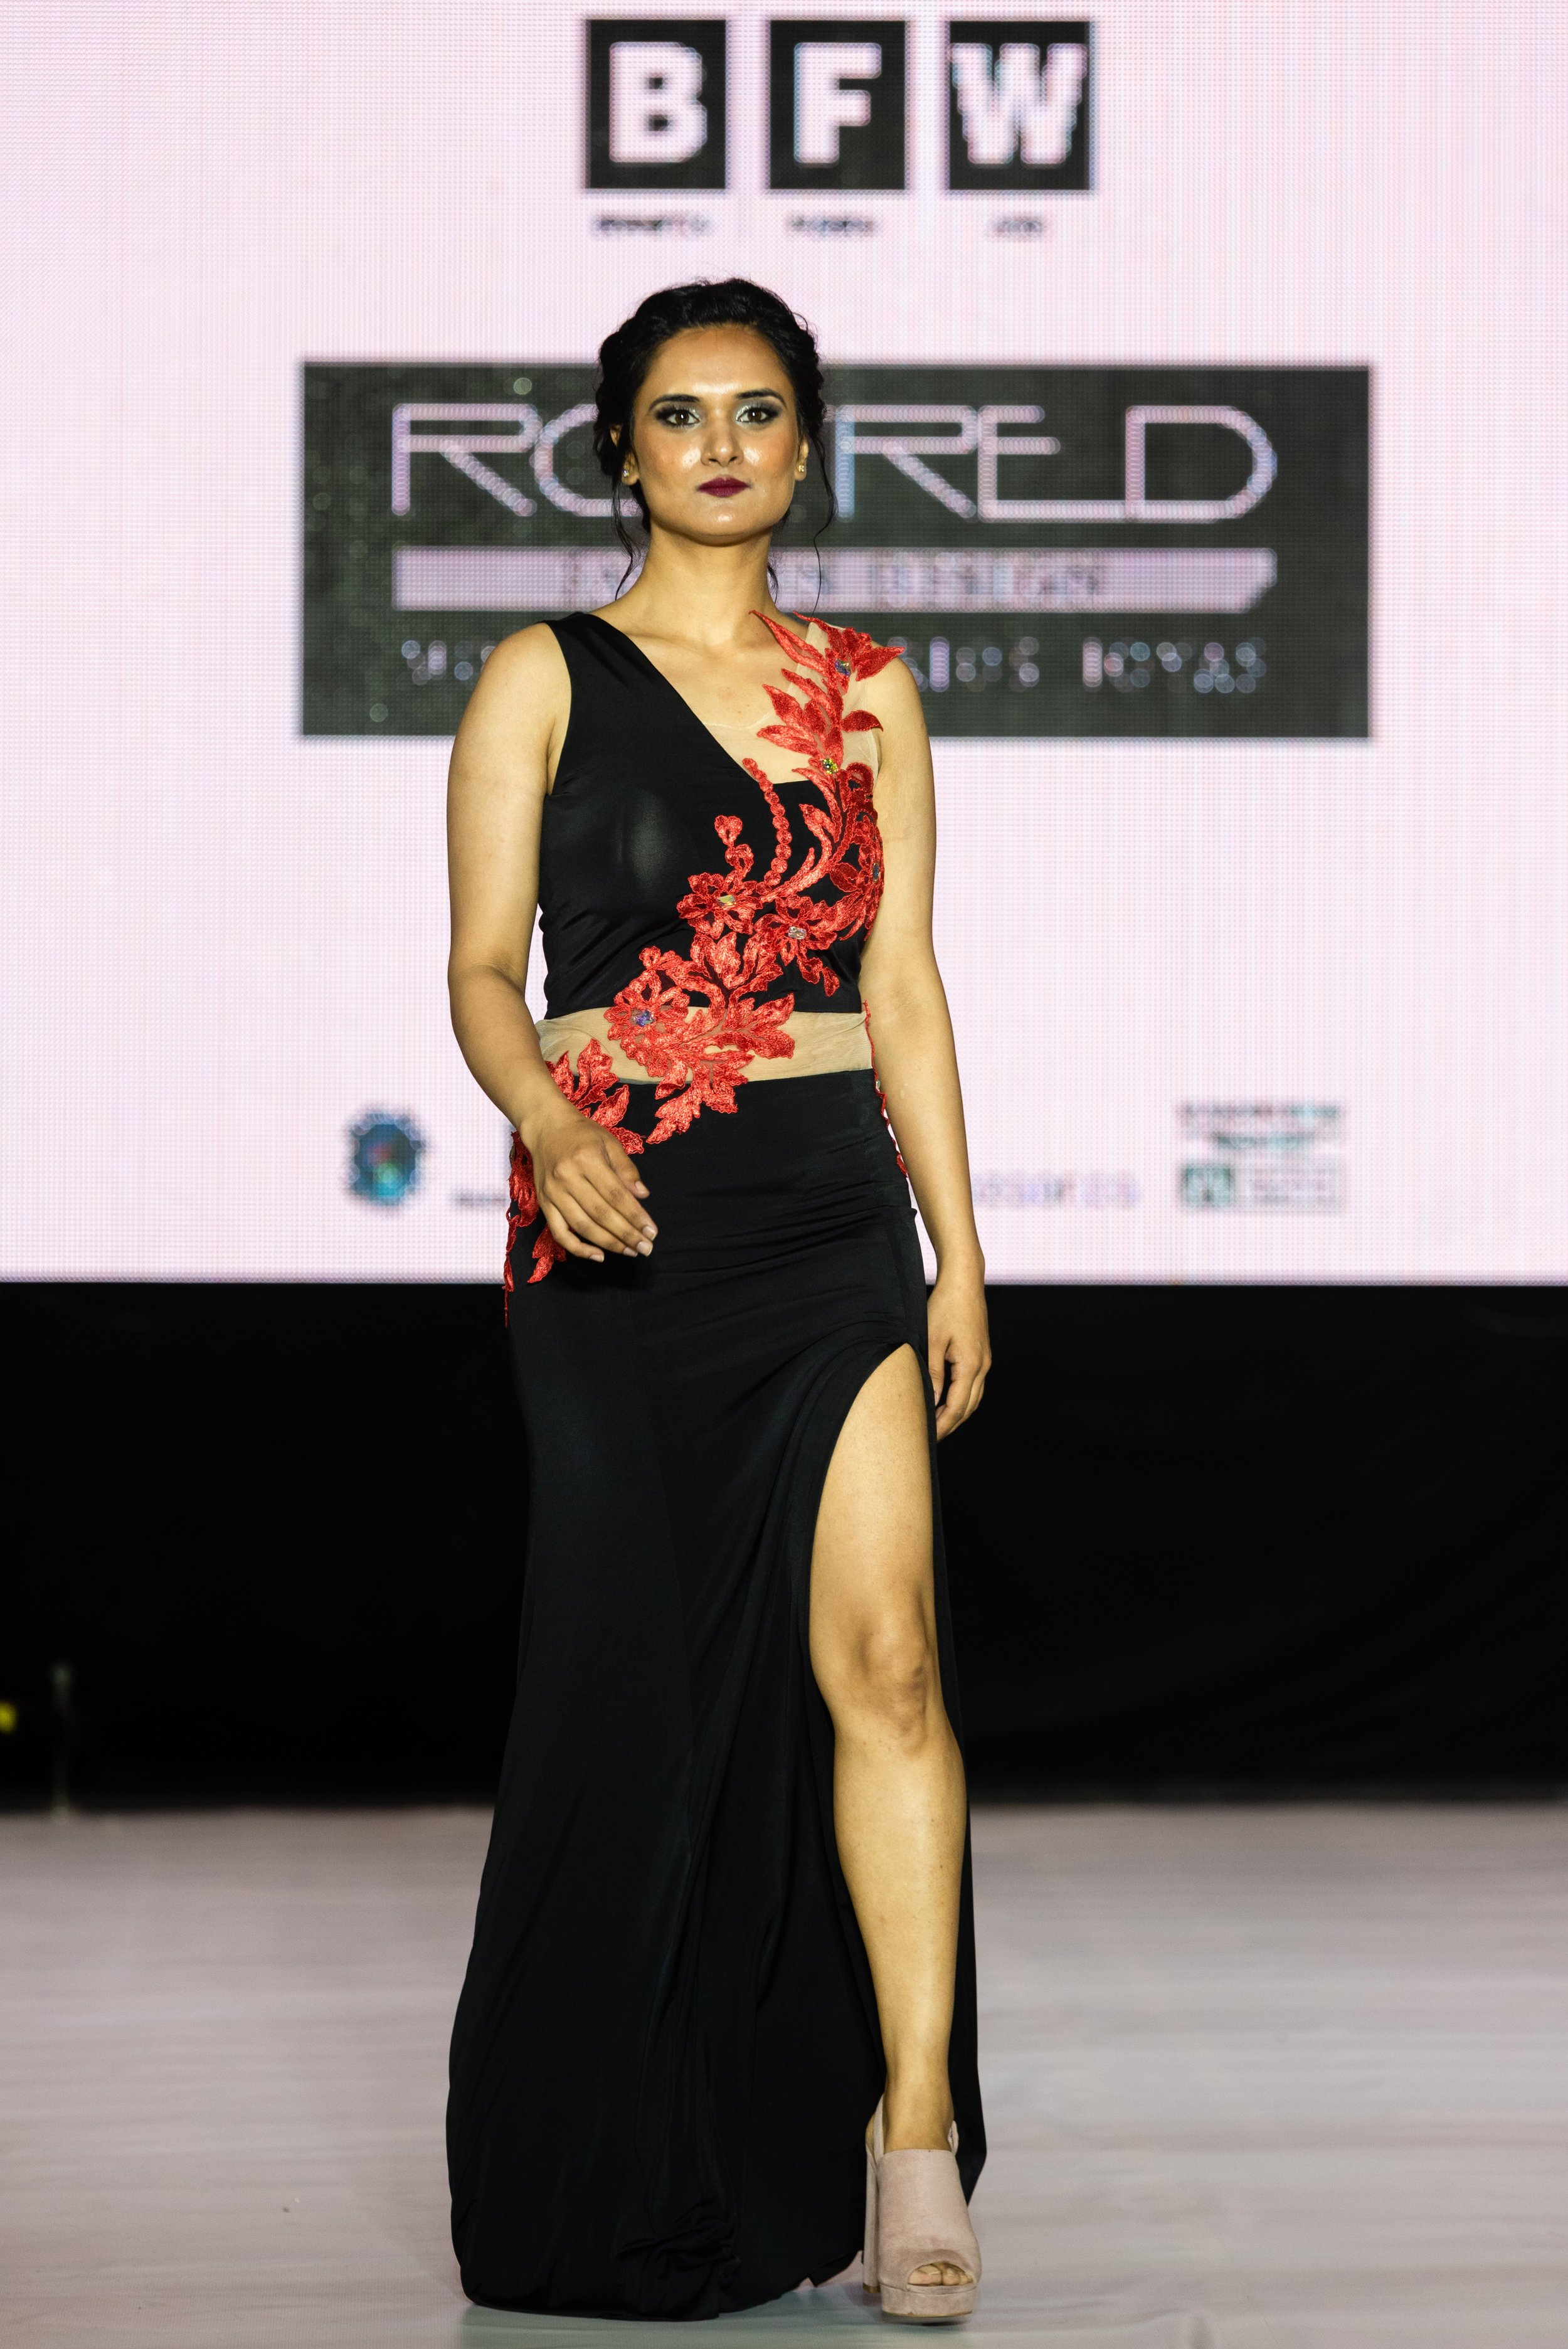 BFW10 - Rosred Fashion Design-SKN_5045.jpg